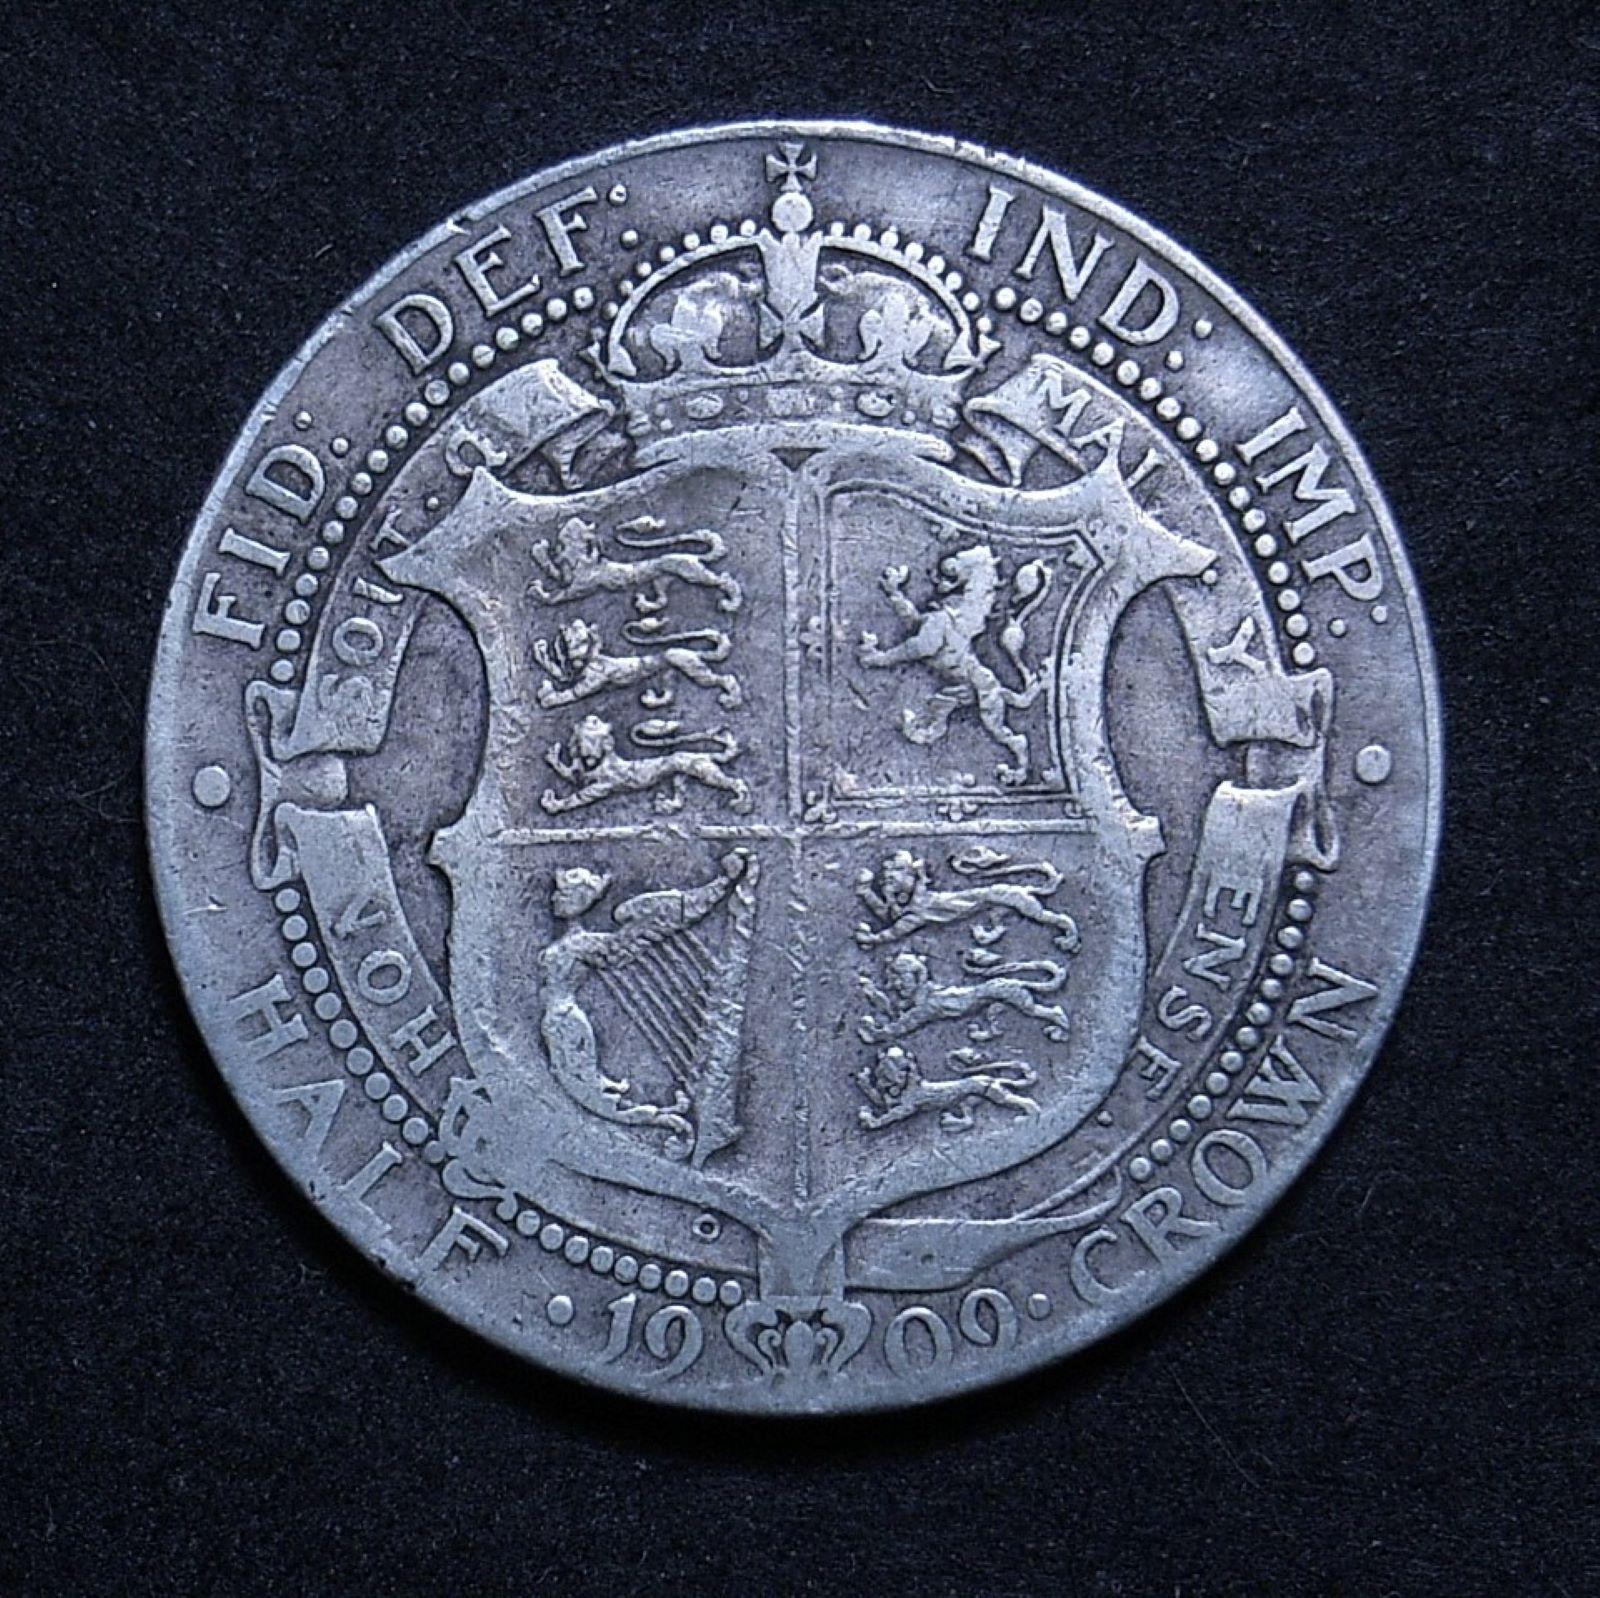 UK Half Crown 1909 rev 1